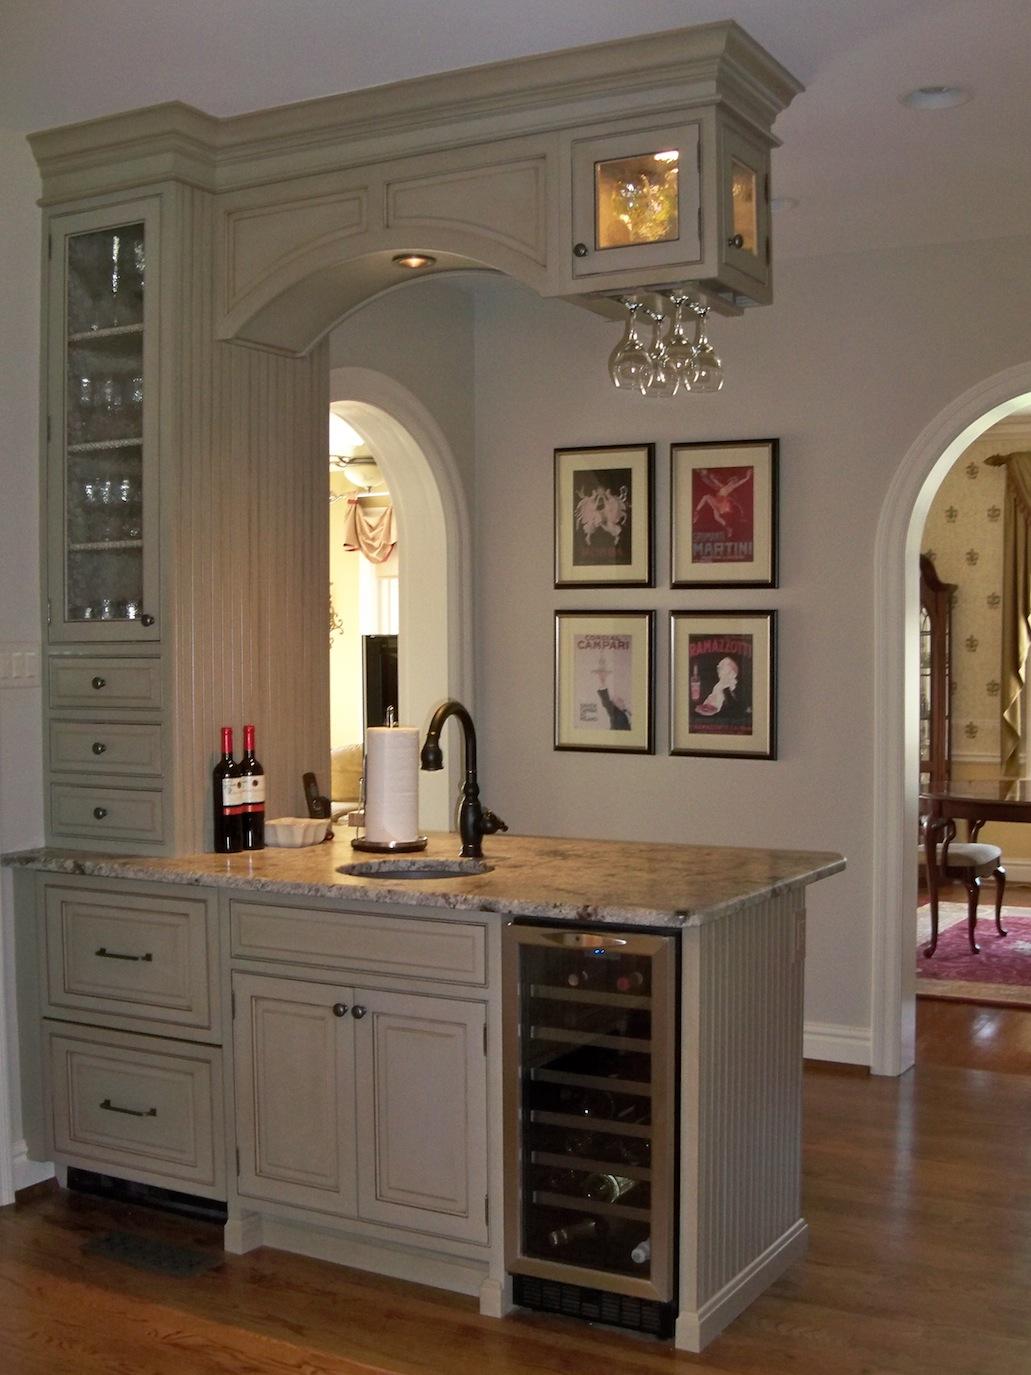 Kitchen Tour Exclusive #2 by Victoria Dreste